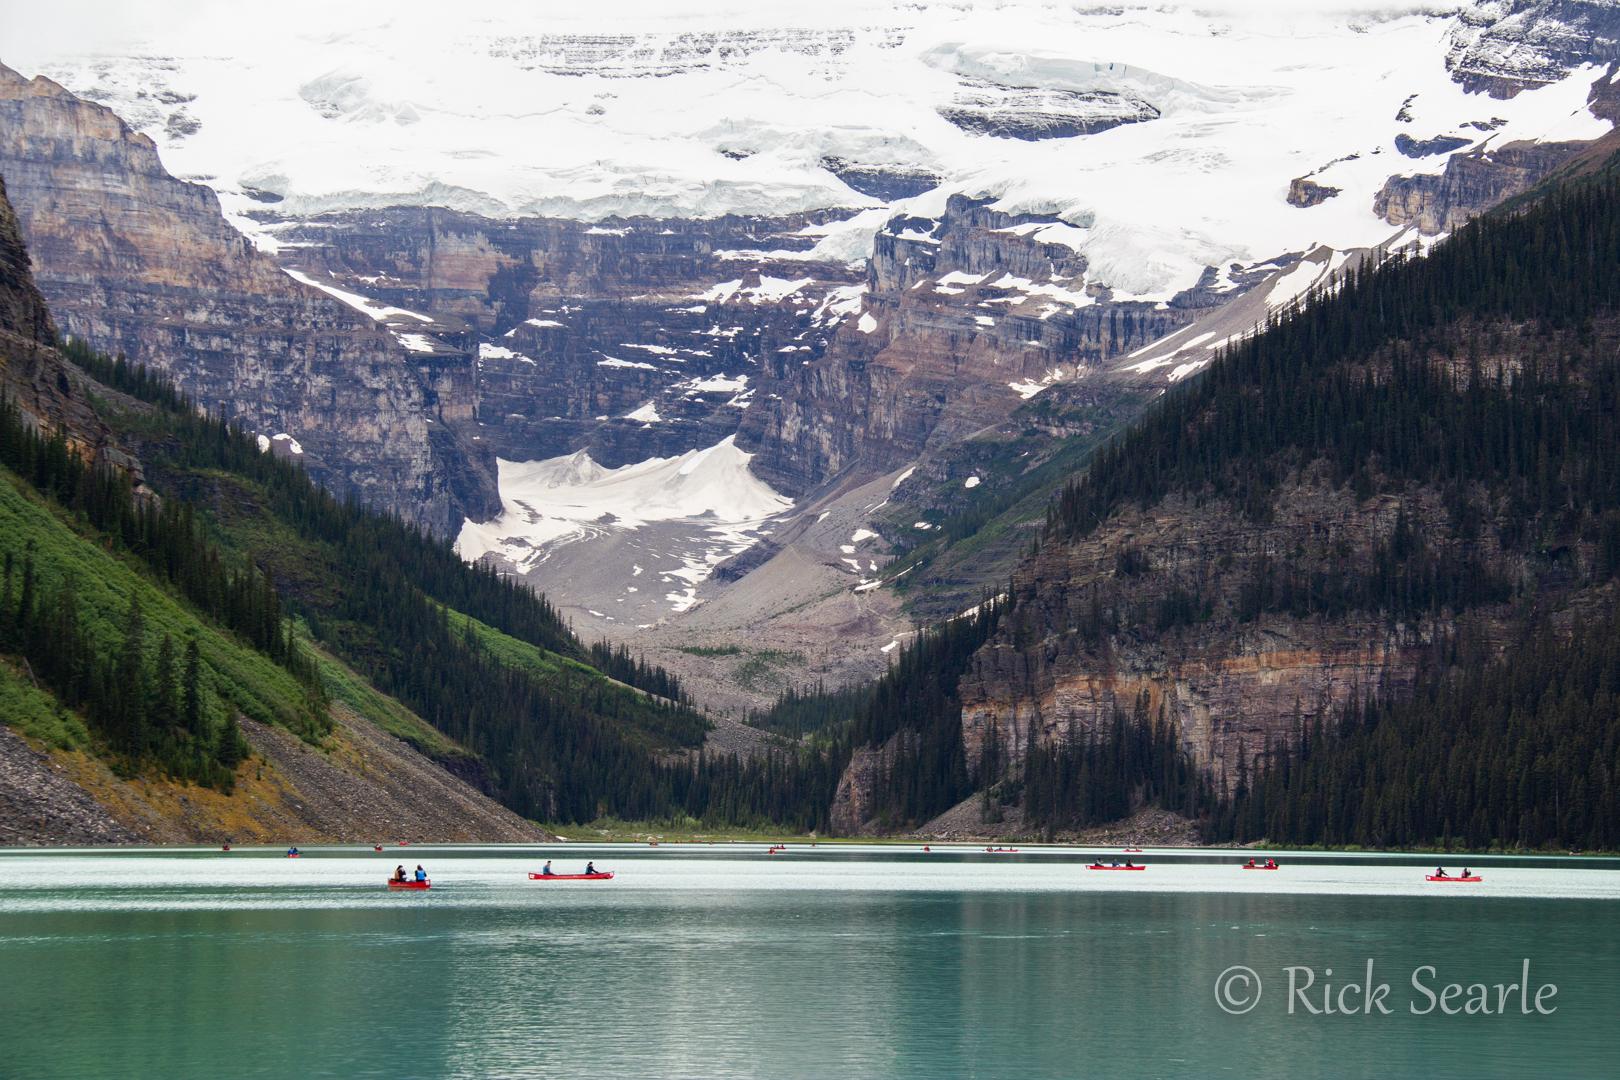 Canoeists Lake Louise